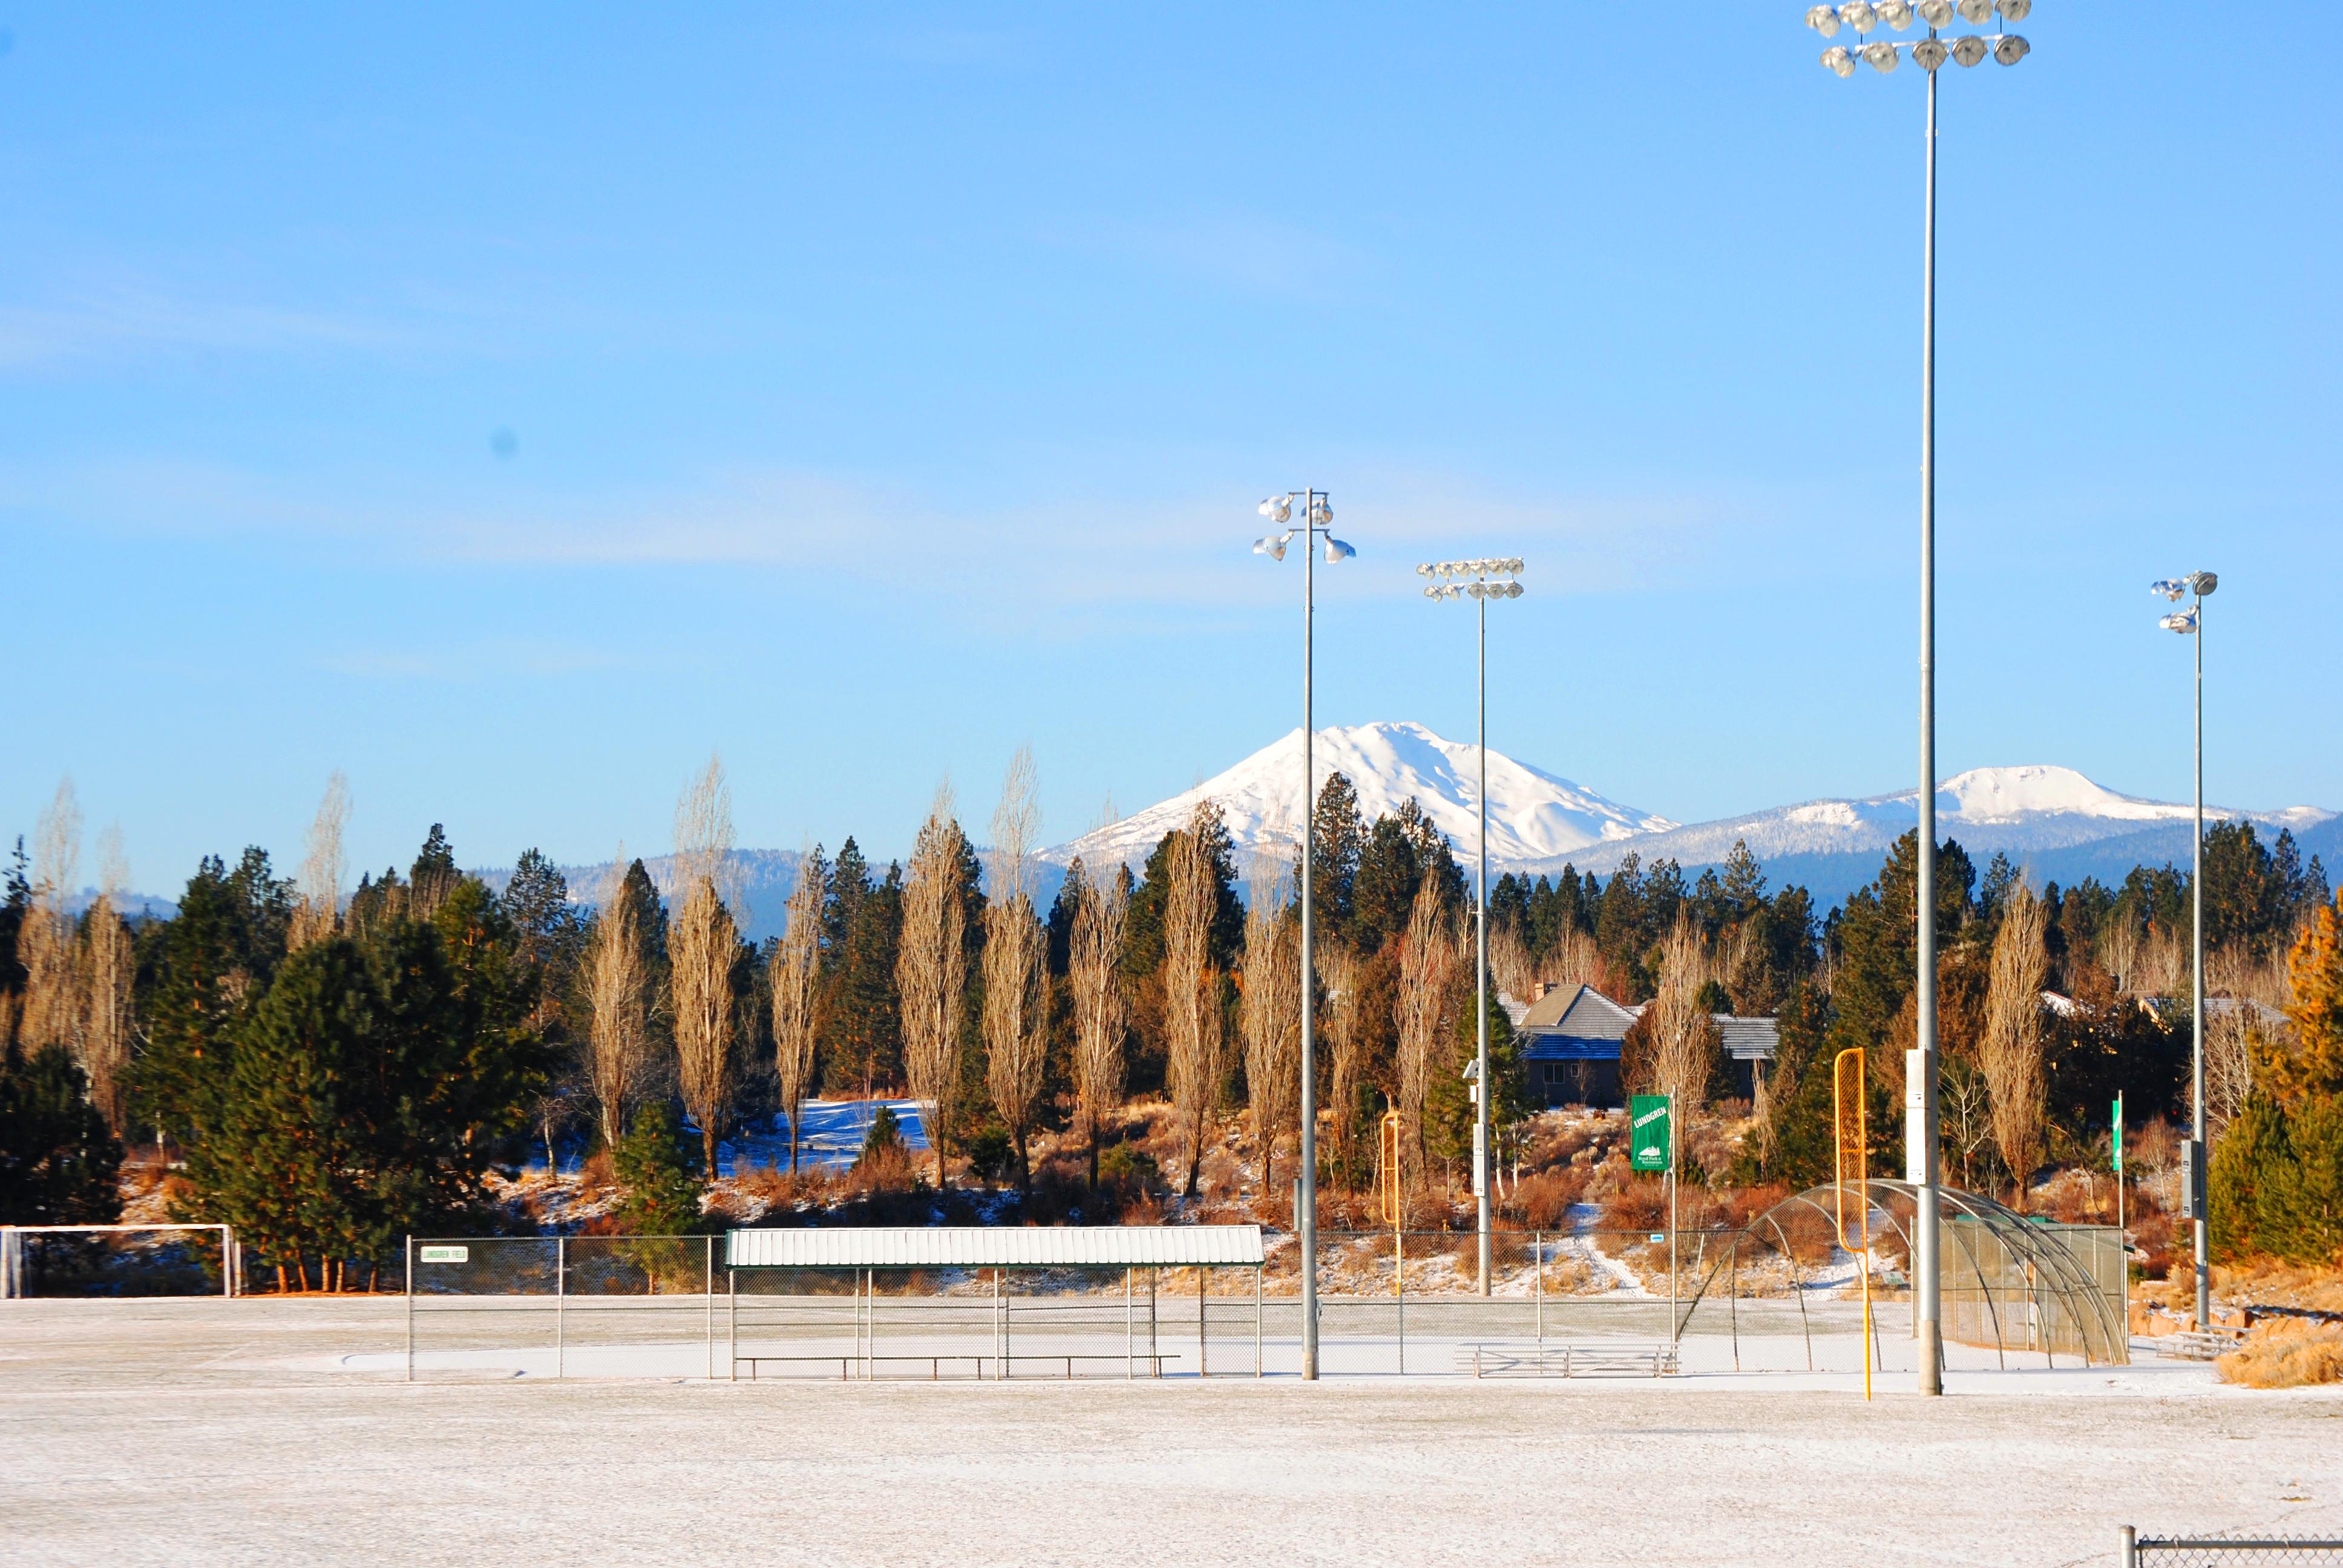 Skyline Sports Complex